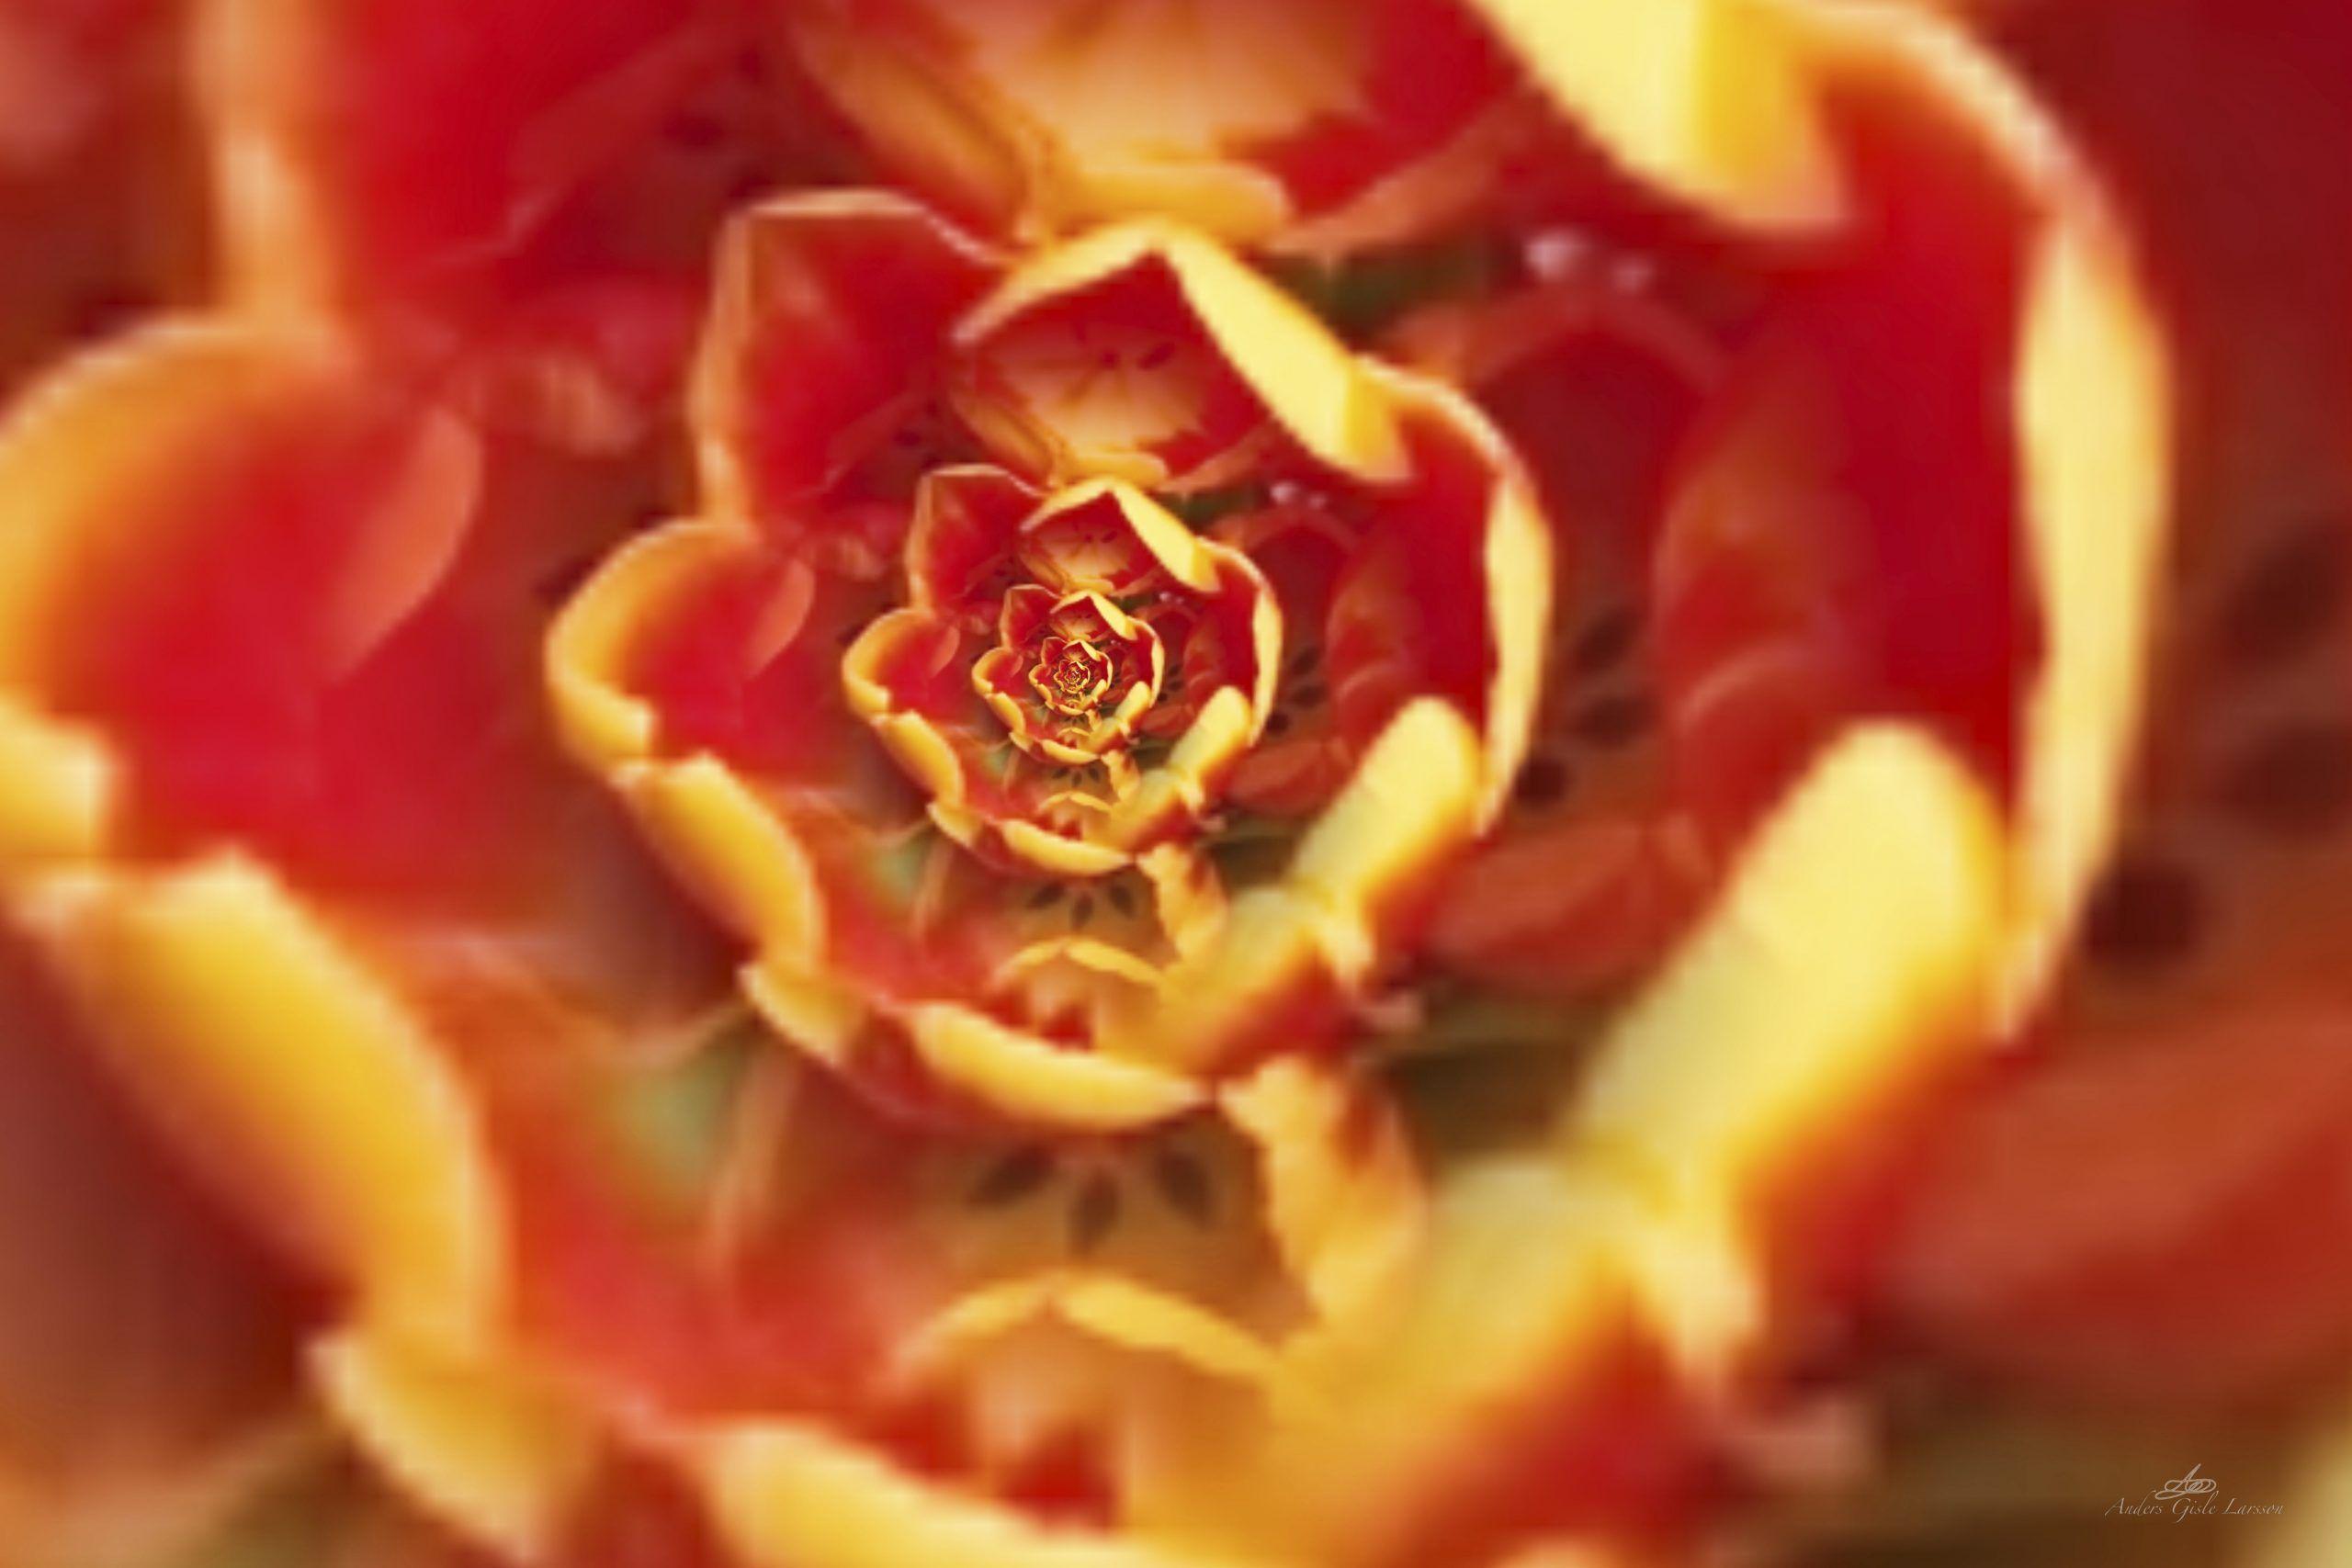 Tulipan i Tulipan, Uge 11, Assentoft, Randers